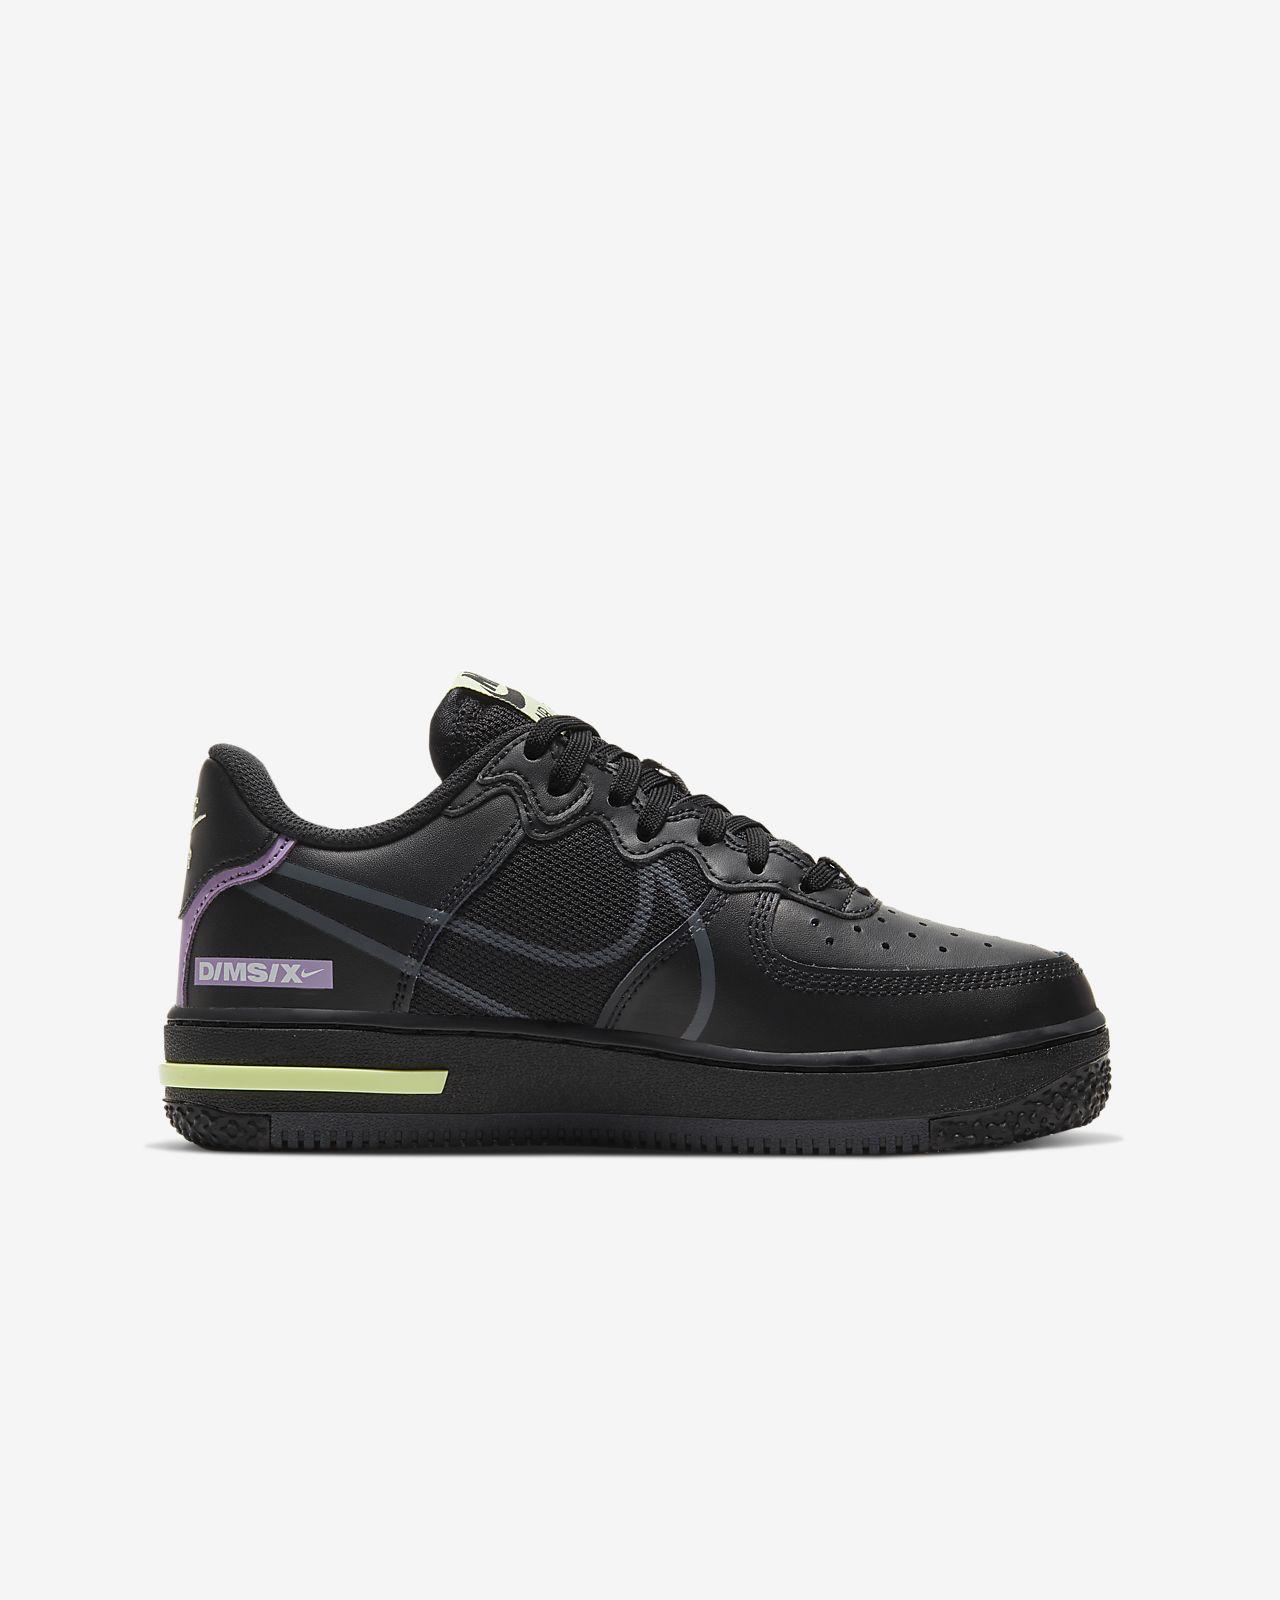 Sapatilhas Nike Air Force 1 Júnior